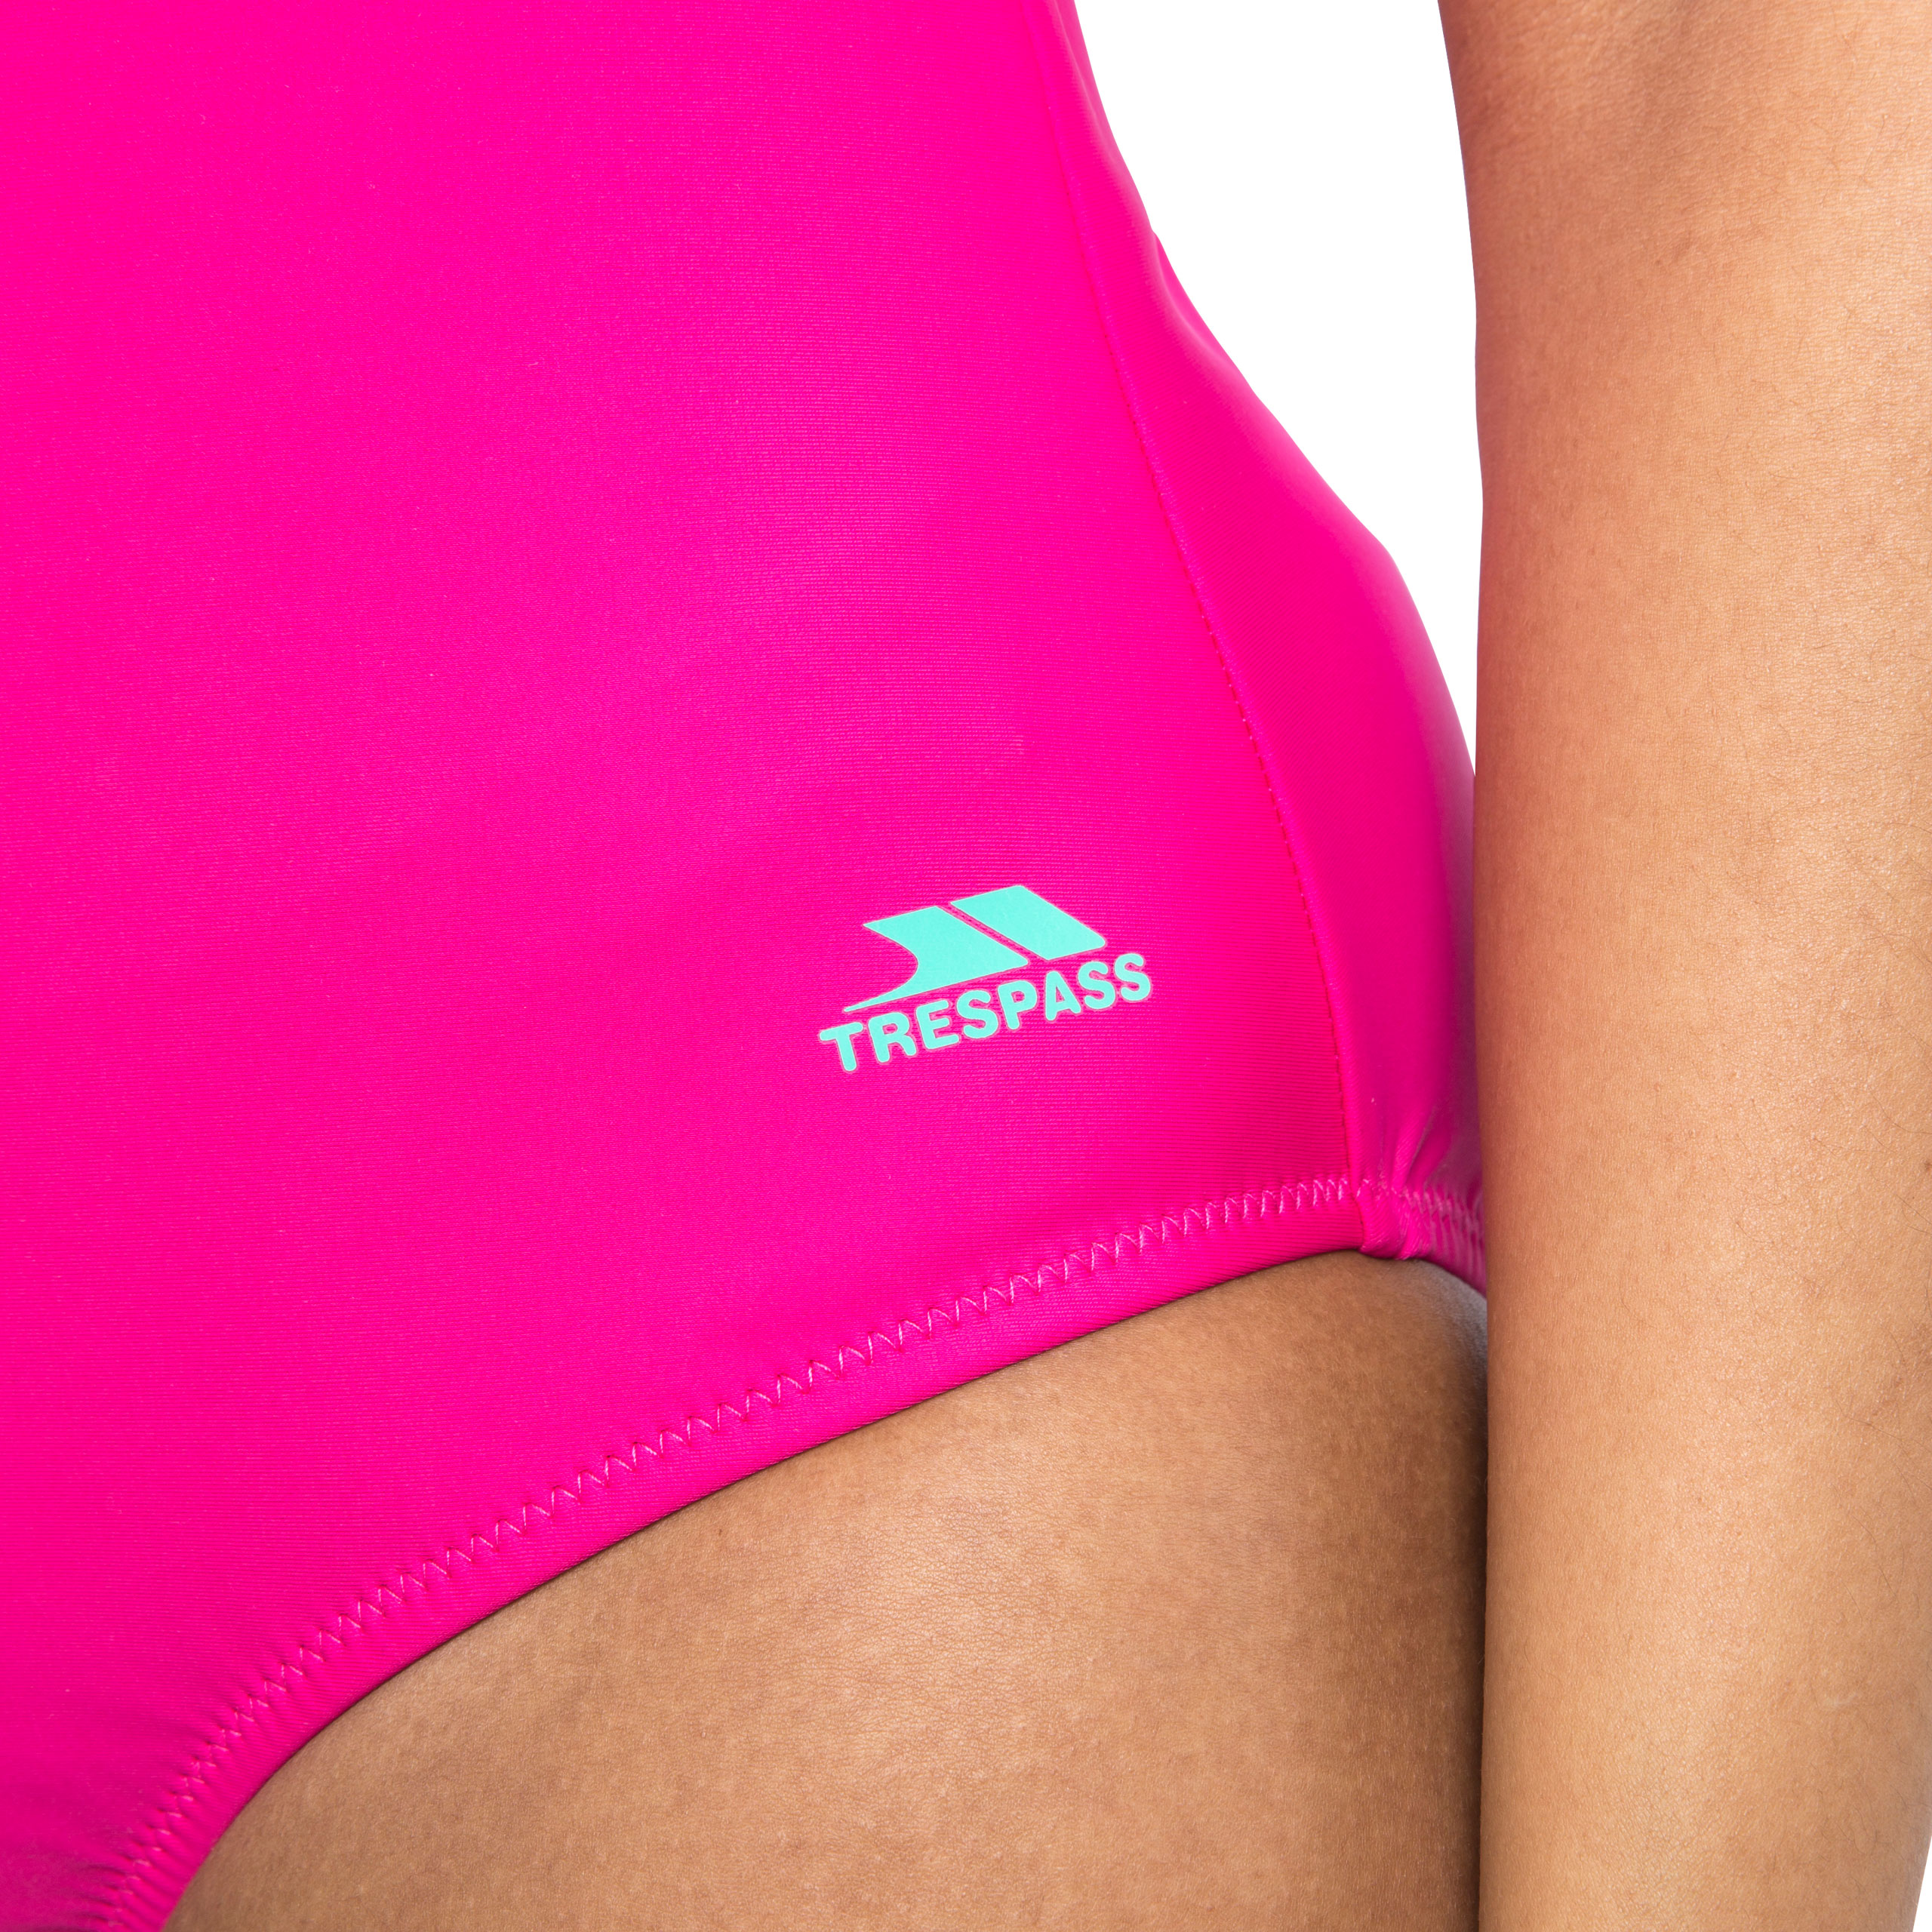 Trespass-Lotty-Womens-One-Piece-Swimsuit-Padded-Swimwear thumbnail 17